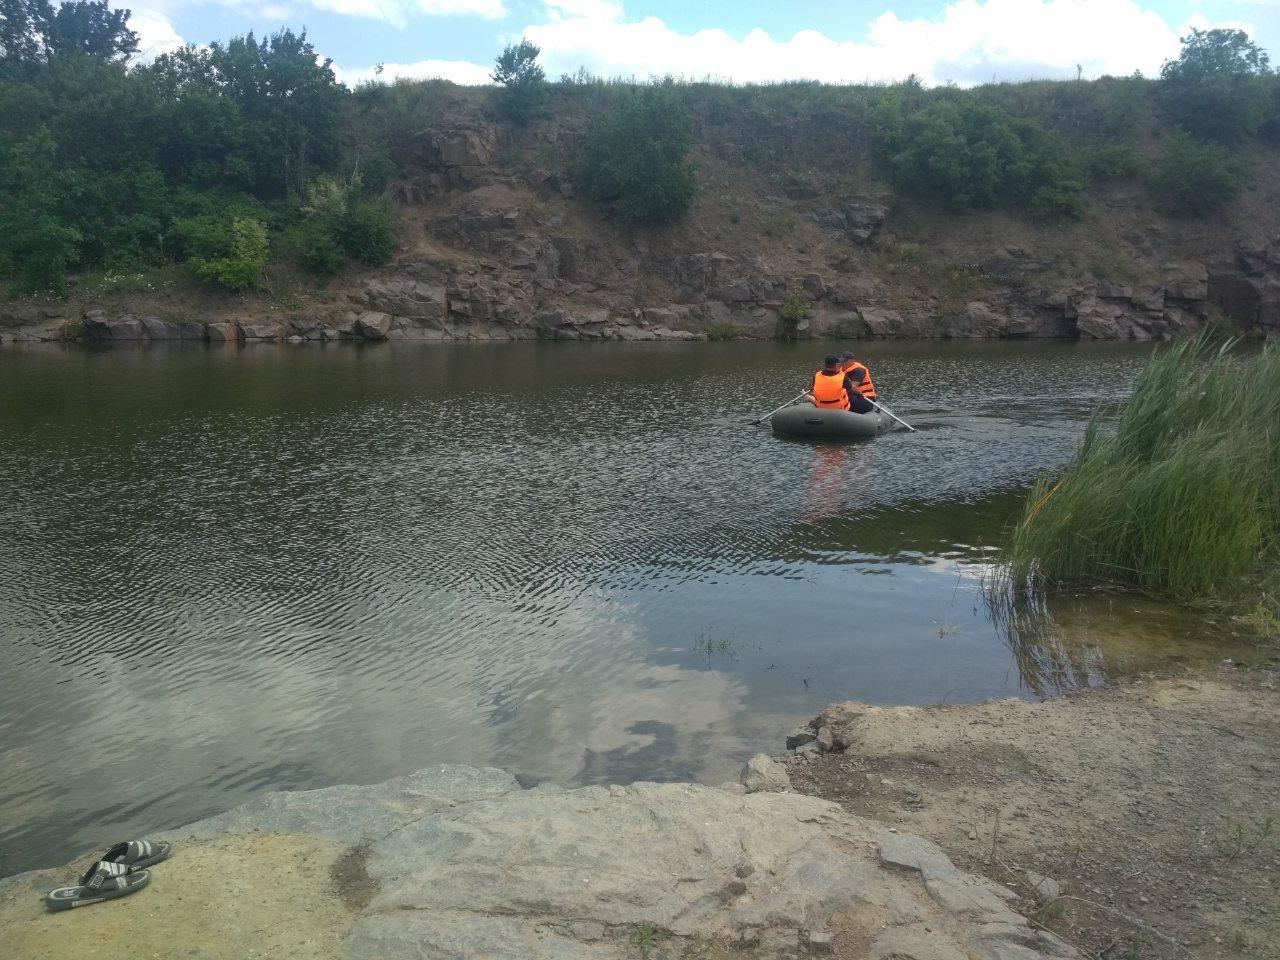 На Кiровоградщинi протягом дня з водойм дiстали чотирьох загиблих людей (ФОТО)